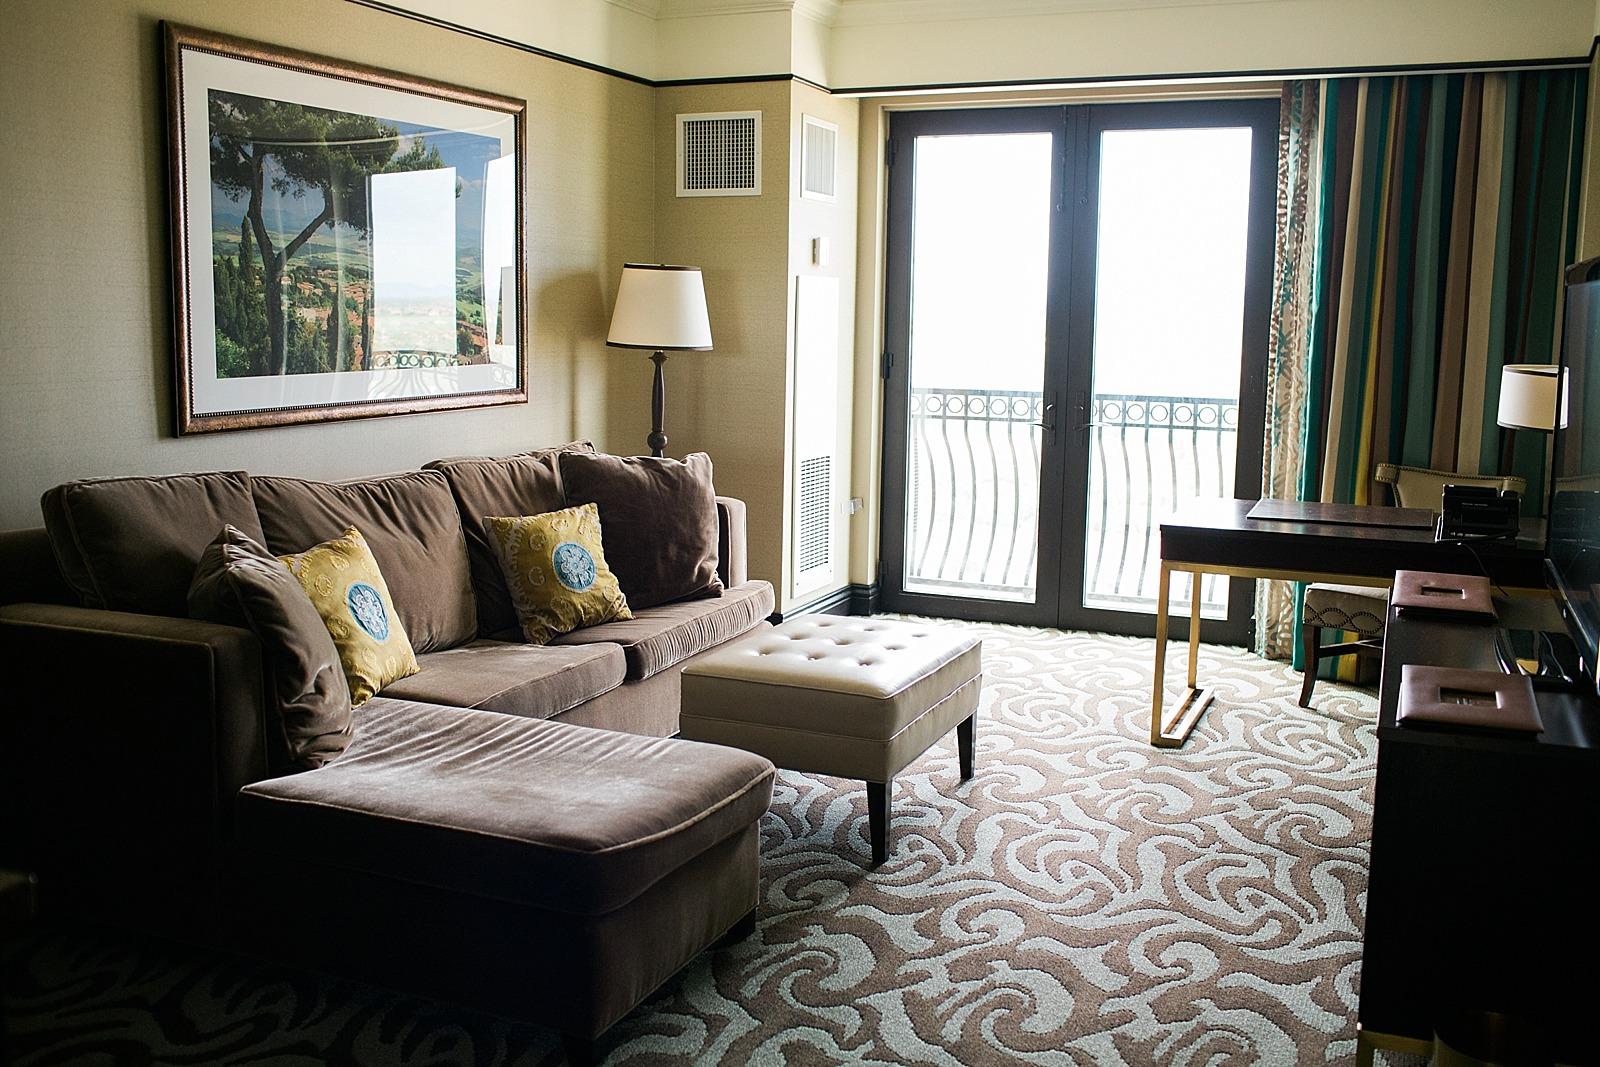 casino-del-sol-hotel-tucson-review-stay-diana-elizabeth-blog_0014